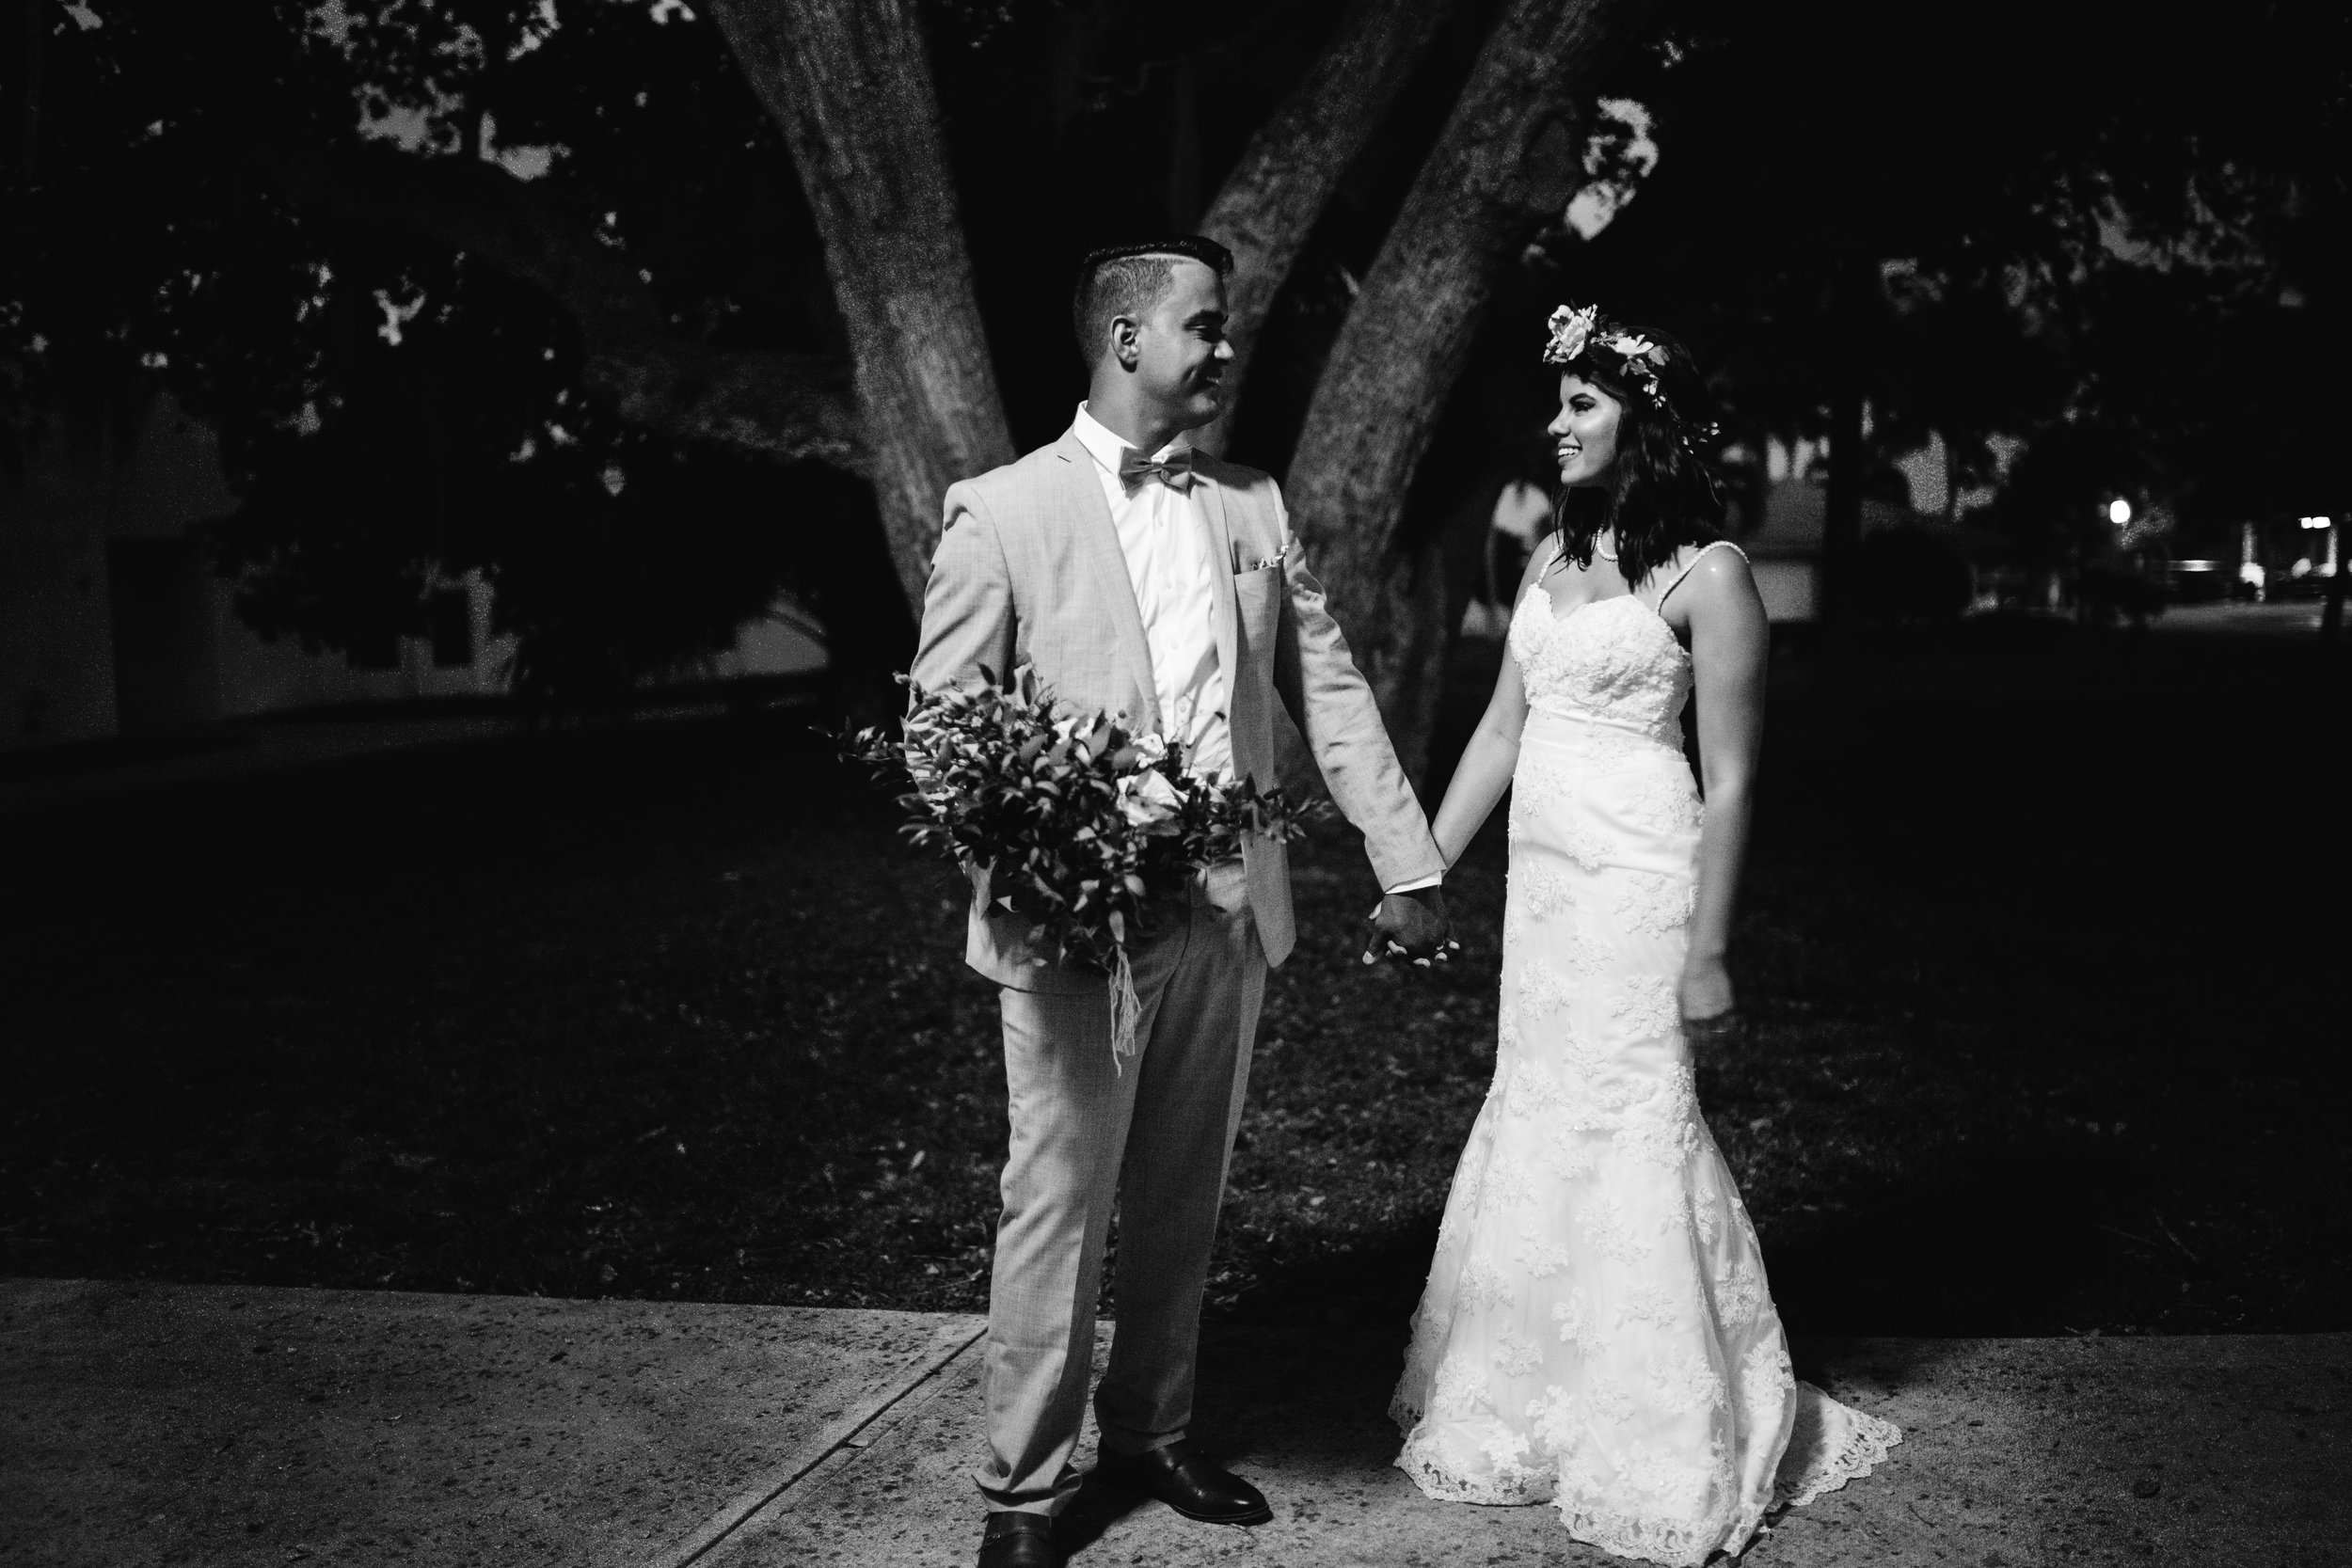 2017.05.23 Barbara and Mauricio Sales Port St Lucie Wedding (539 of 772).jpg